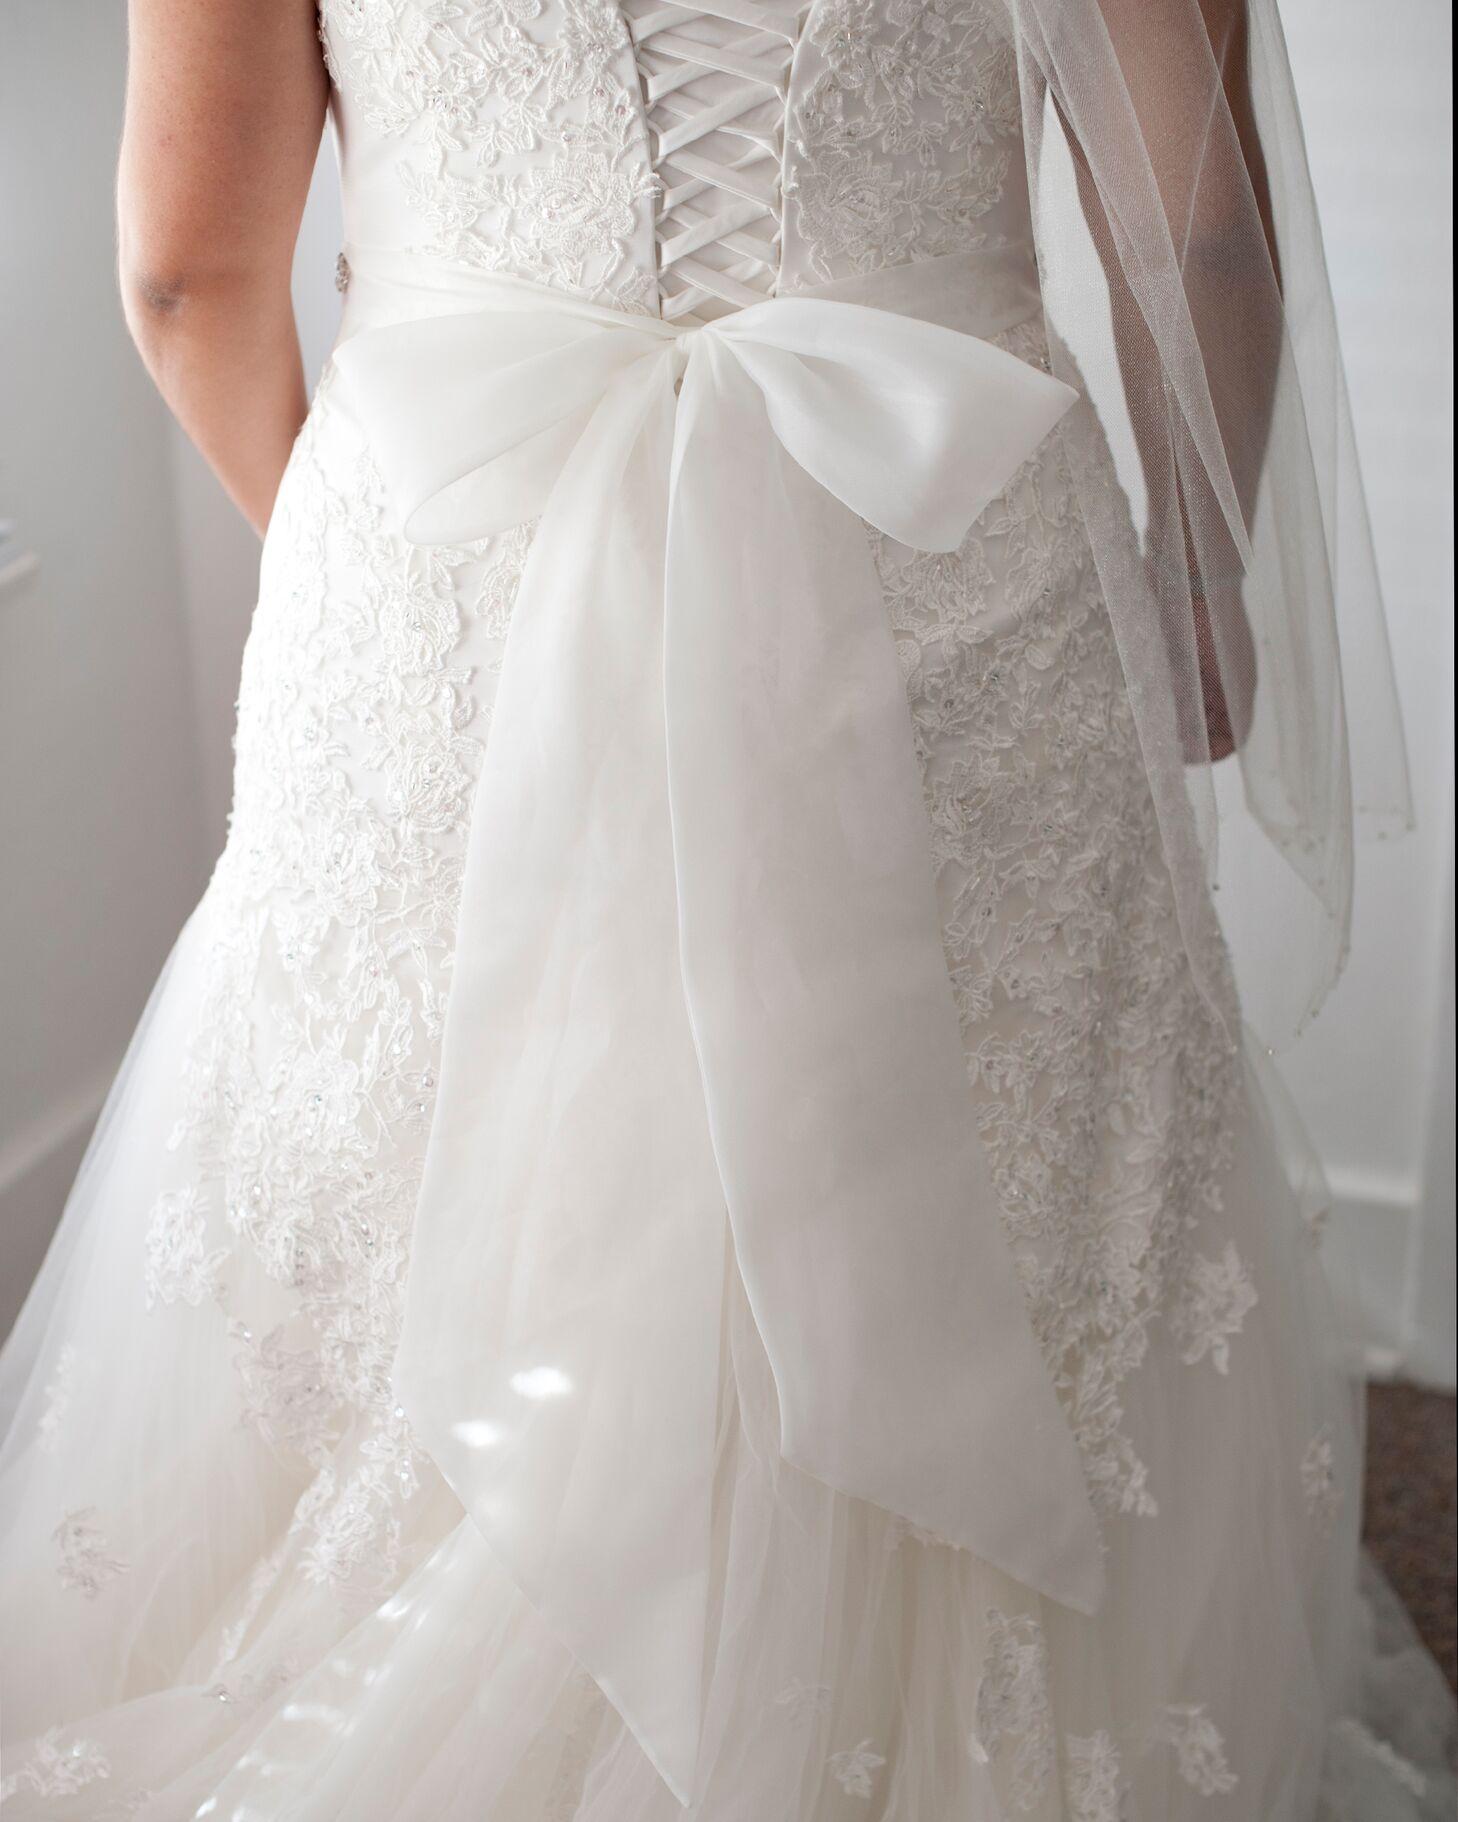 Corset Bodice Wedding Dress with Bow